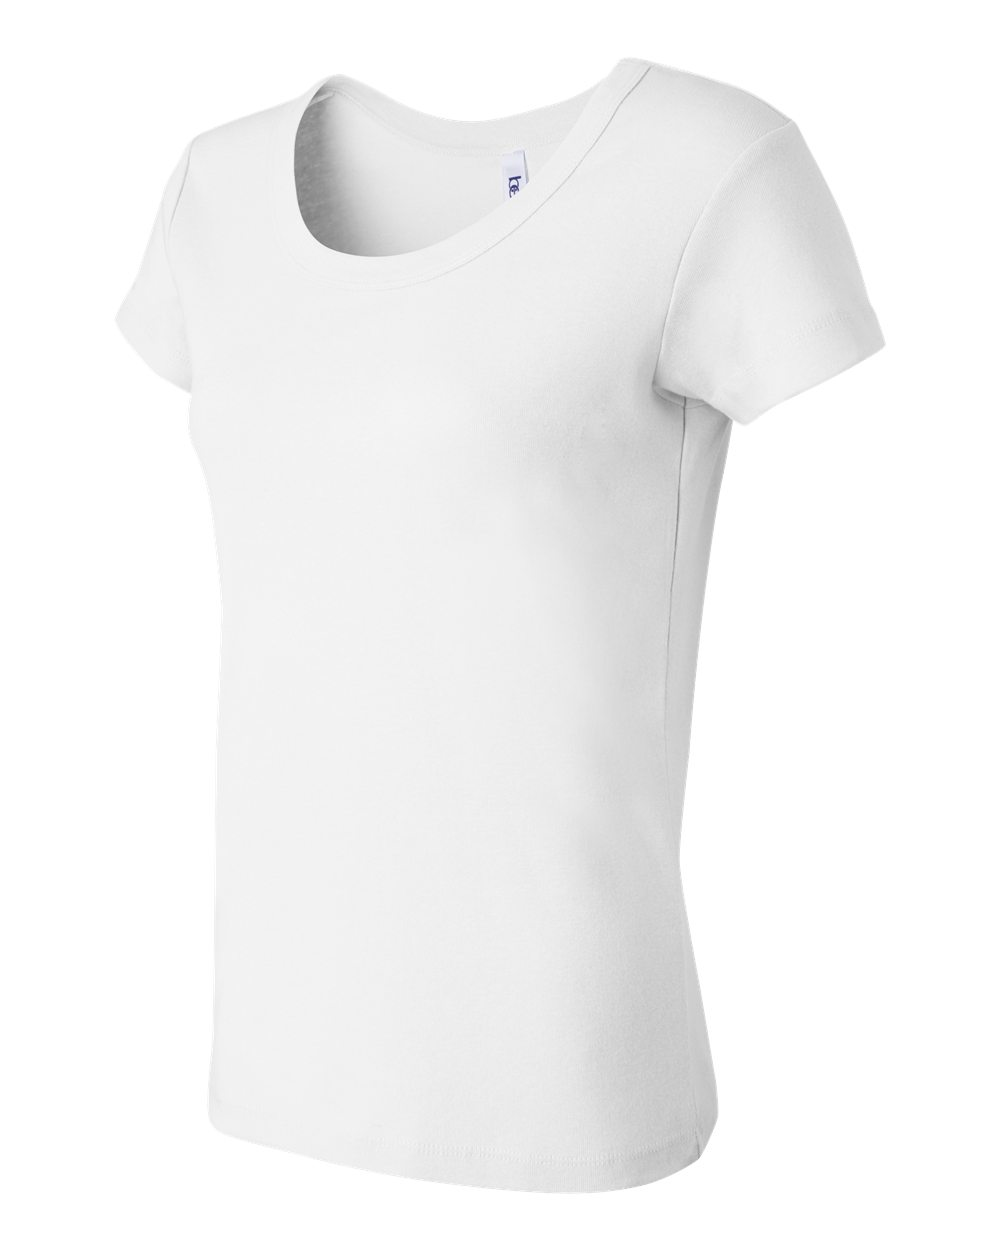 Bella-Canvas-Women-039-s-Stretch-Rib-Short-Sleeve-Scoop-Neck-T-Shirt-B1003-S-2XL thumbnail 4